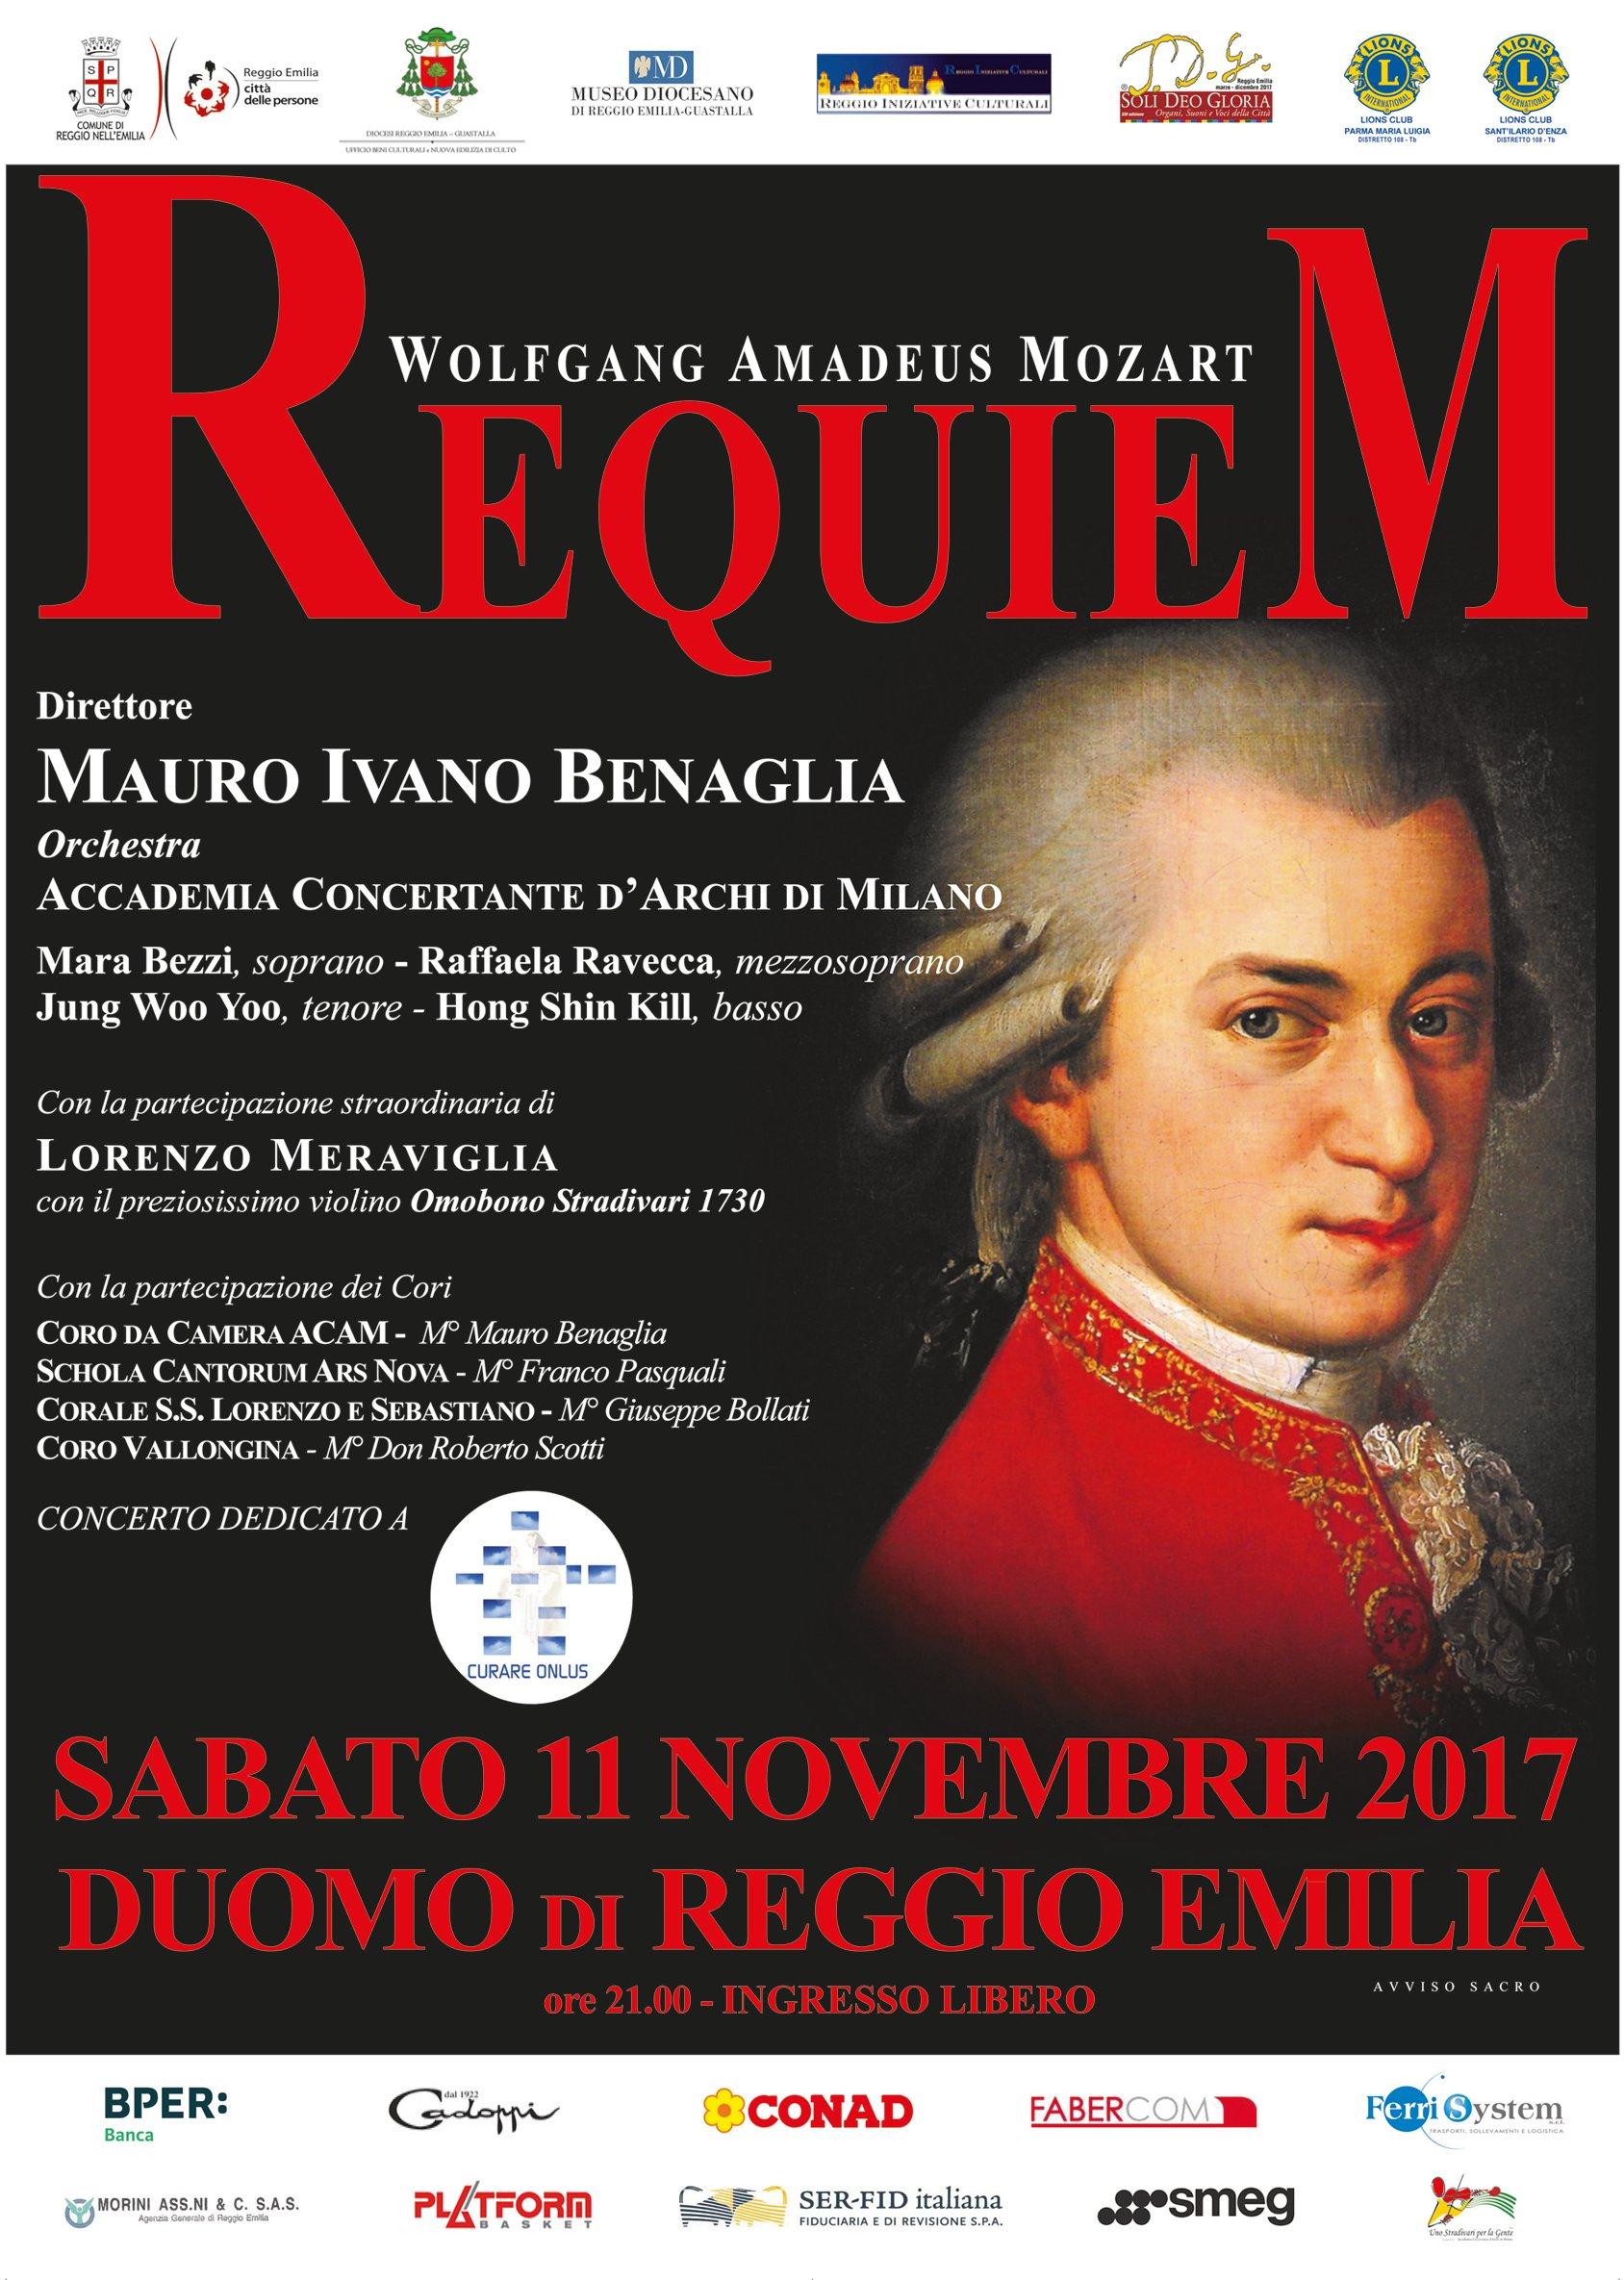 locandina-concerto-11-nov-2017-requiem-mozart